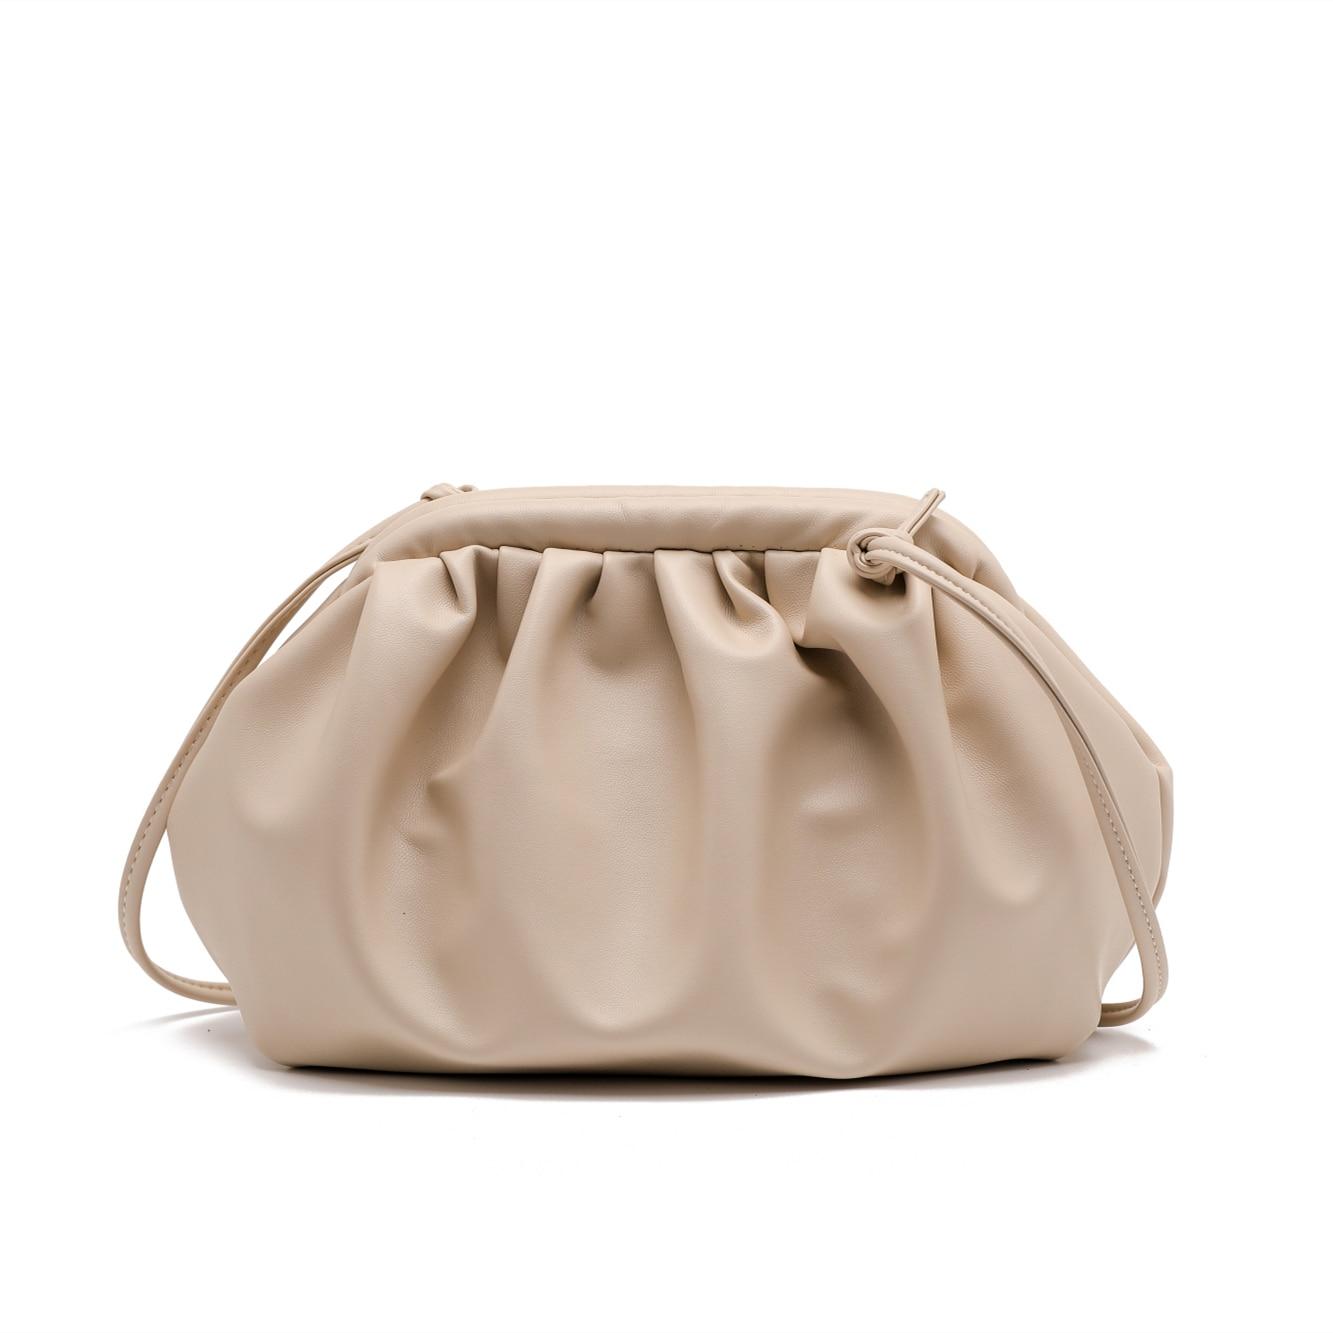 Fashion New Women Bag Small Handbag Shoulder Tote Satchel Ladies Leather Messenger Crossbody Purse